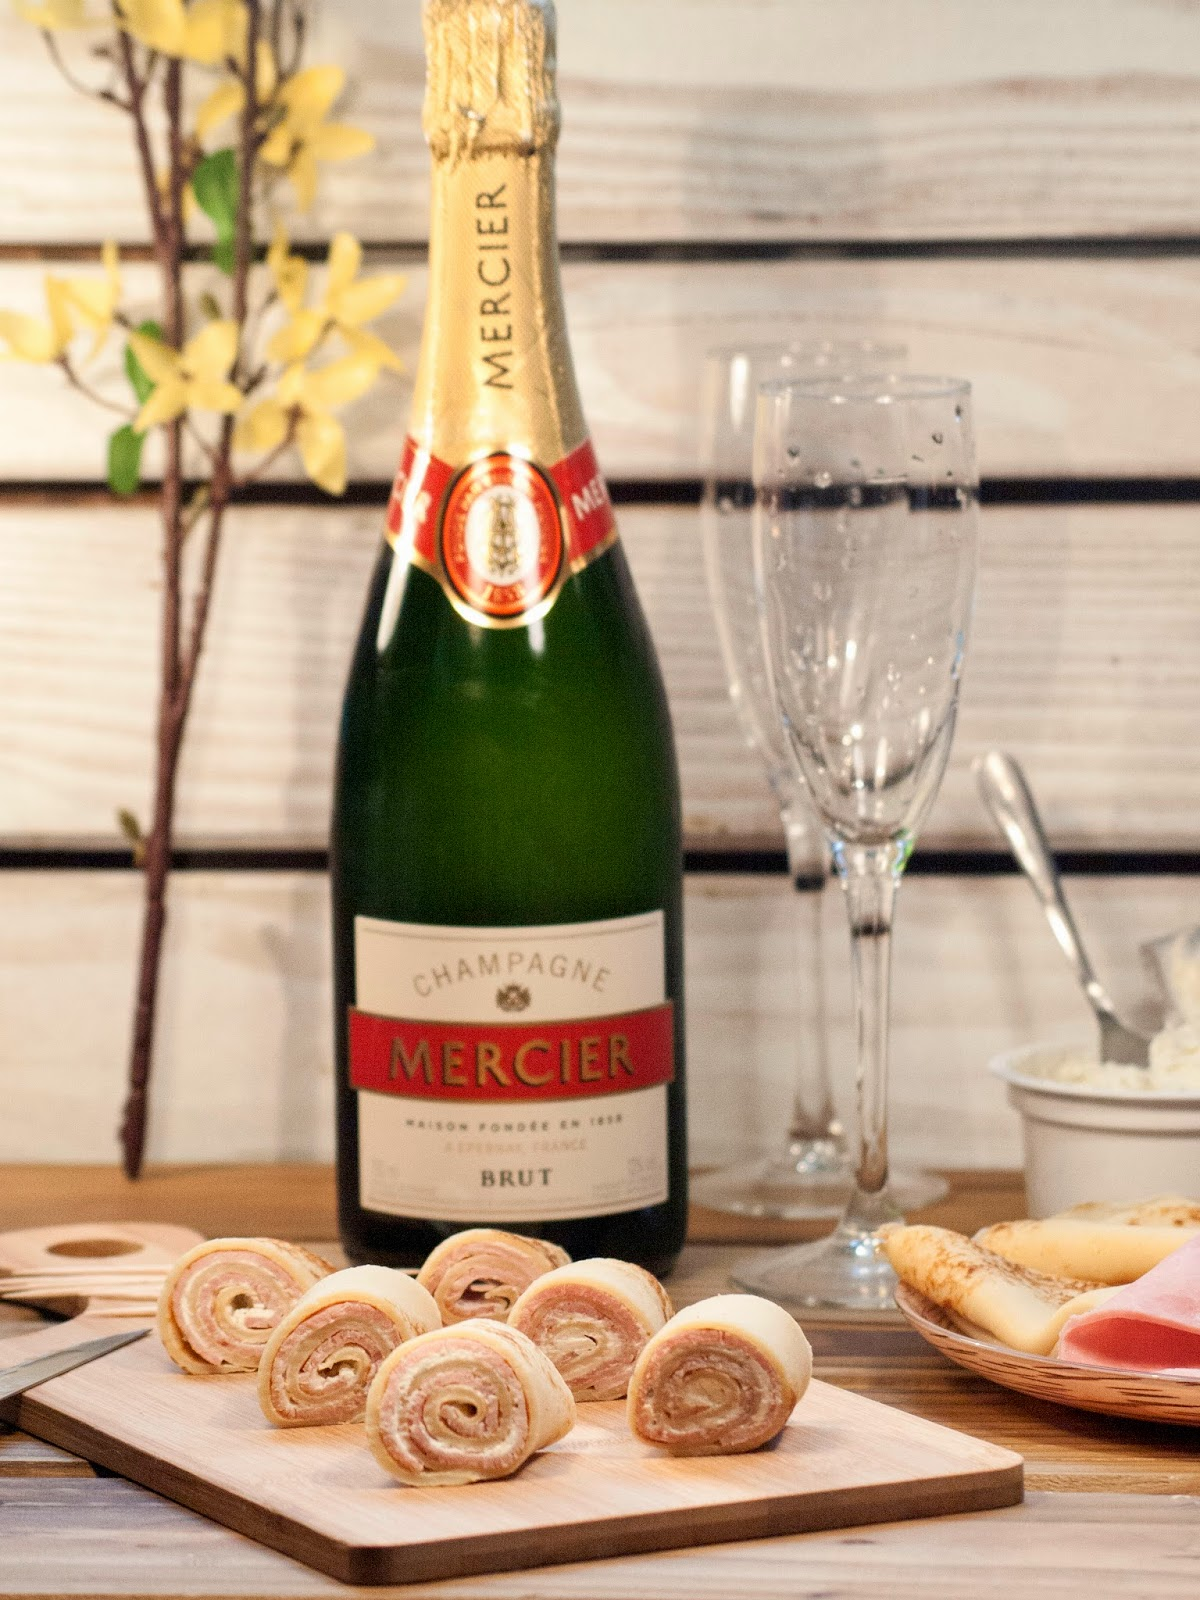 Champagne Mercier Brut, champagne, meilleur champagne